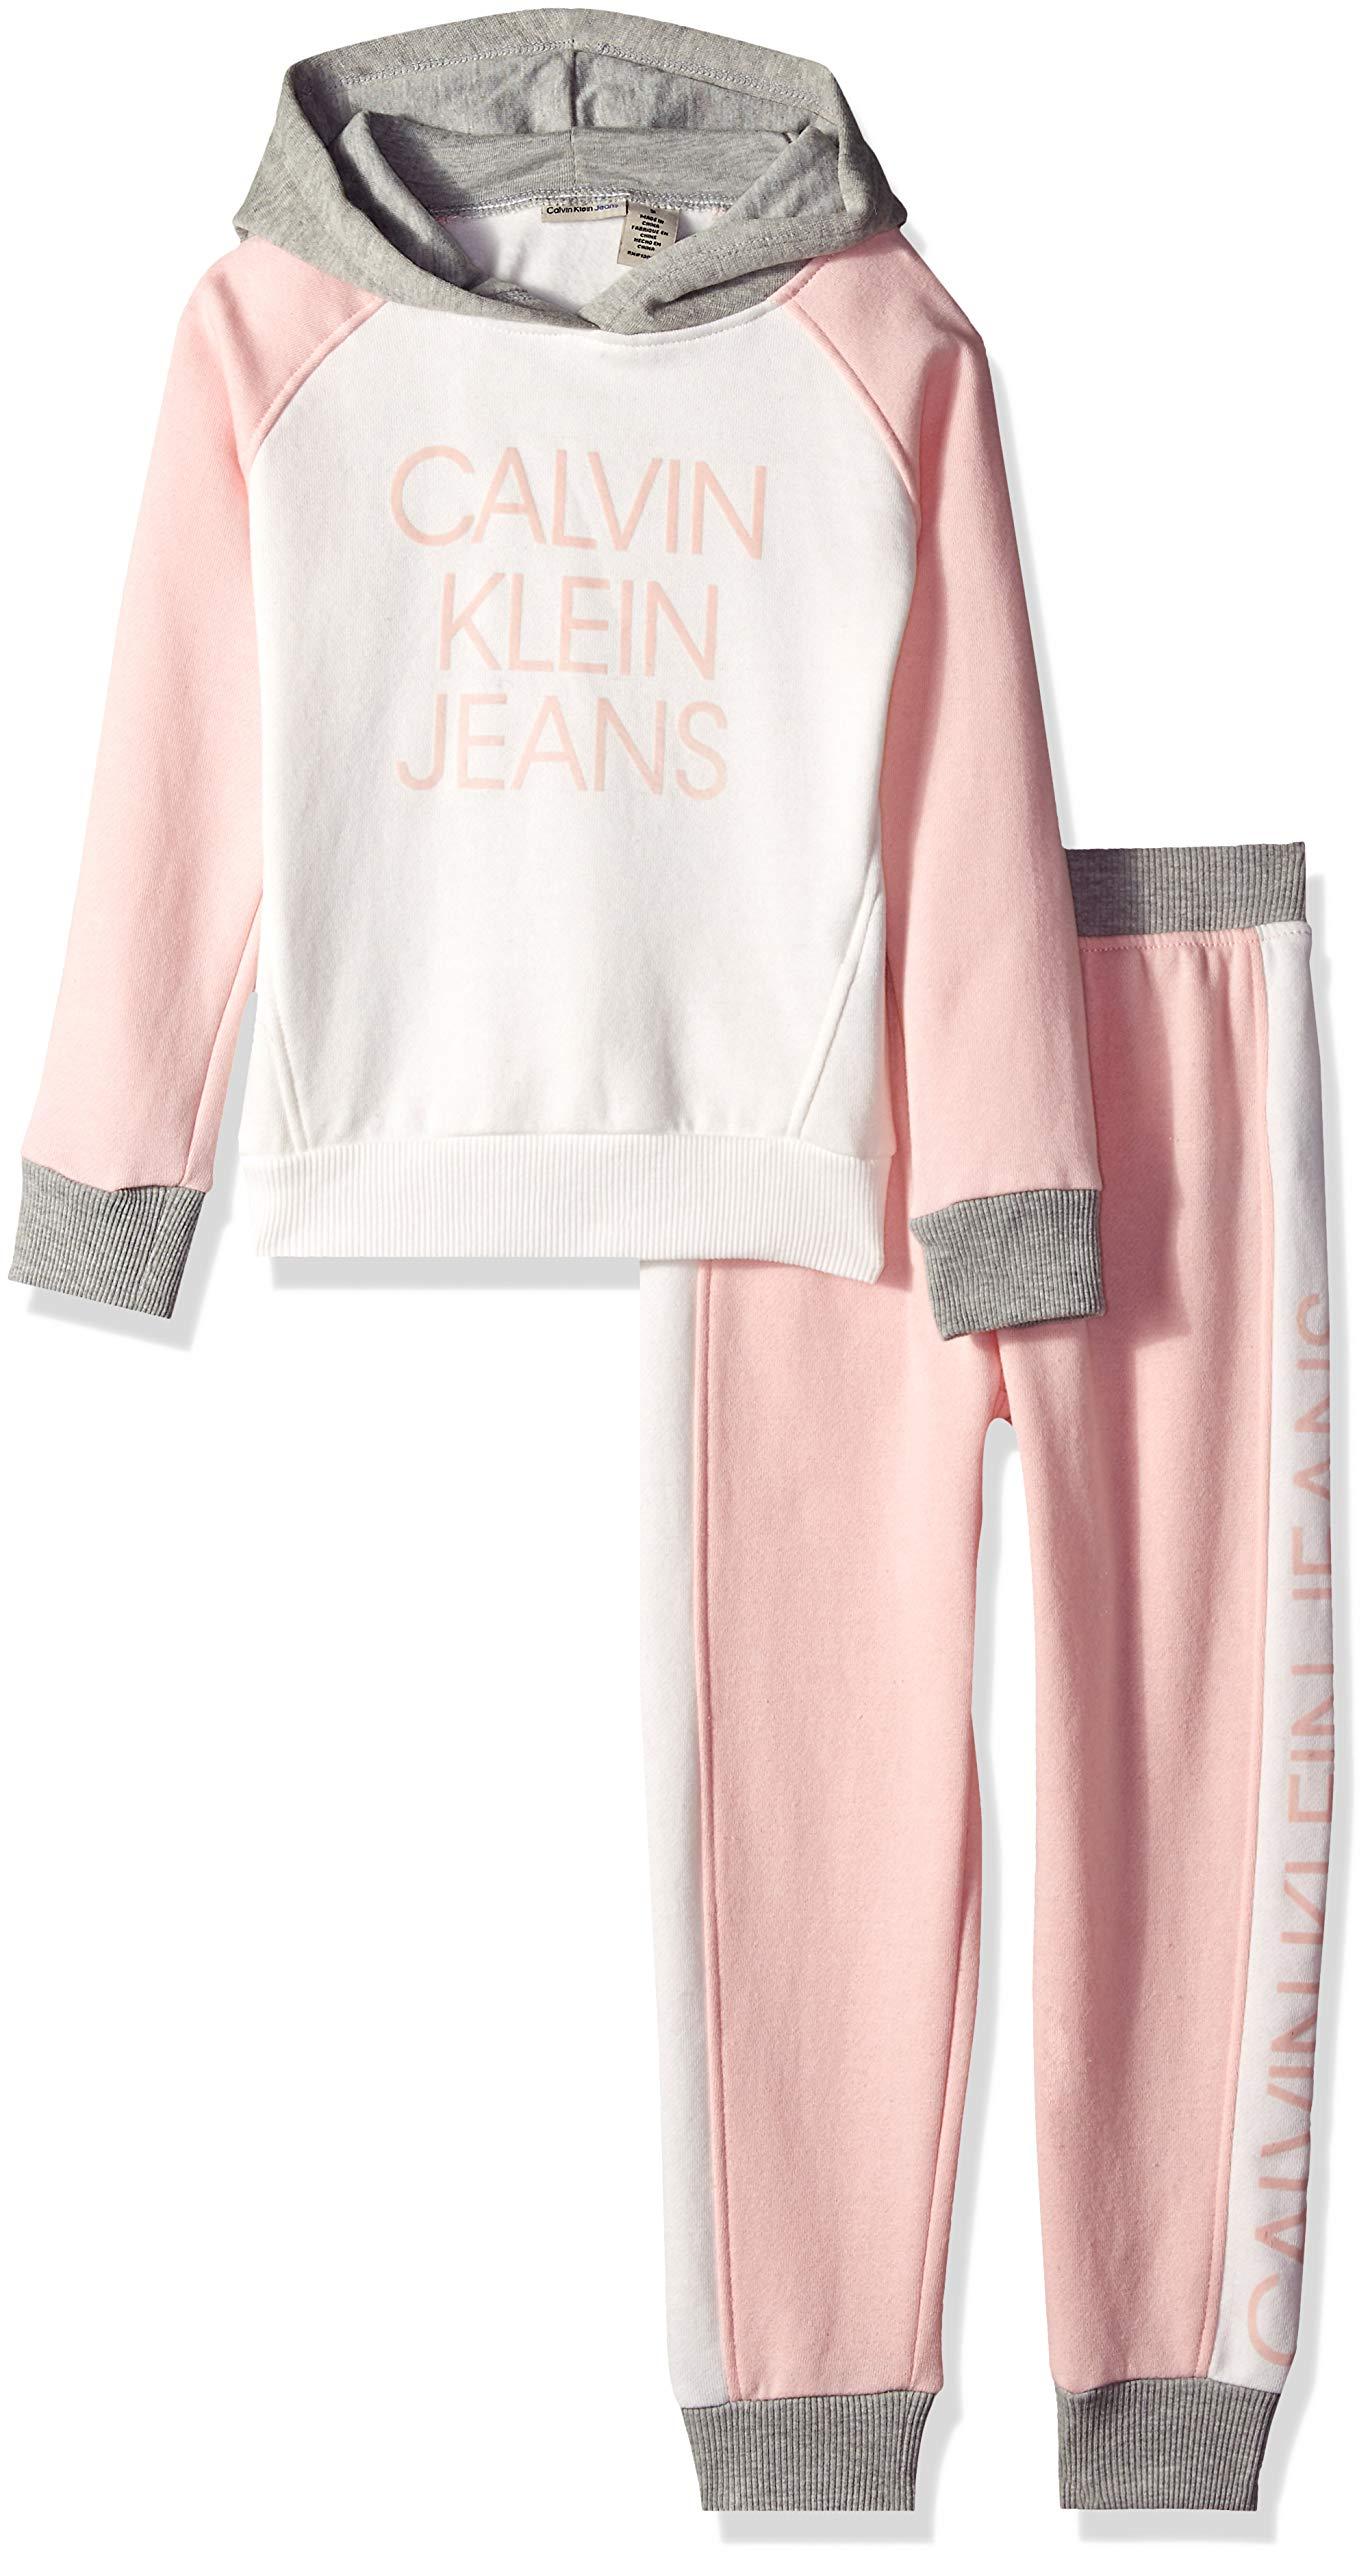 Calvin Klein Girls' Little 2 Pieces Jog Set, Pink/Marshmallow, 5 by Calvin Klein (Image #1)